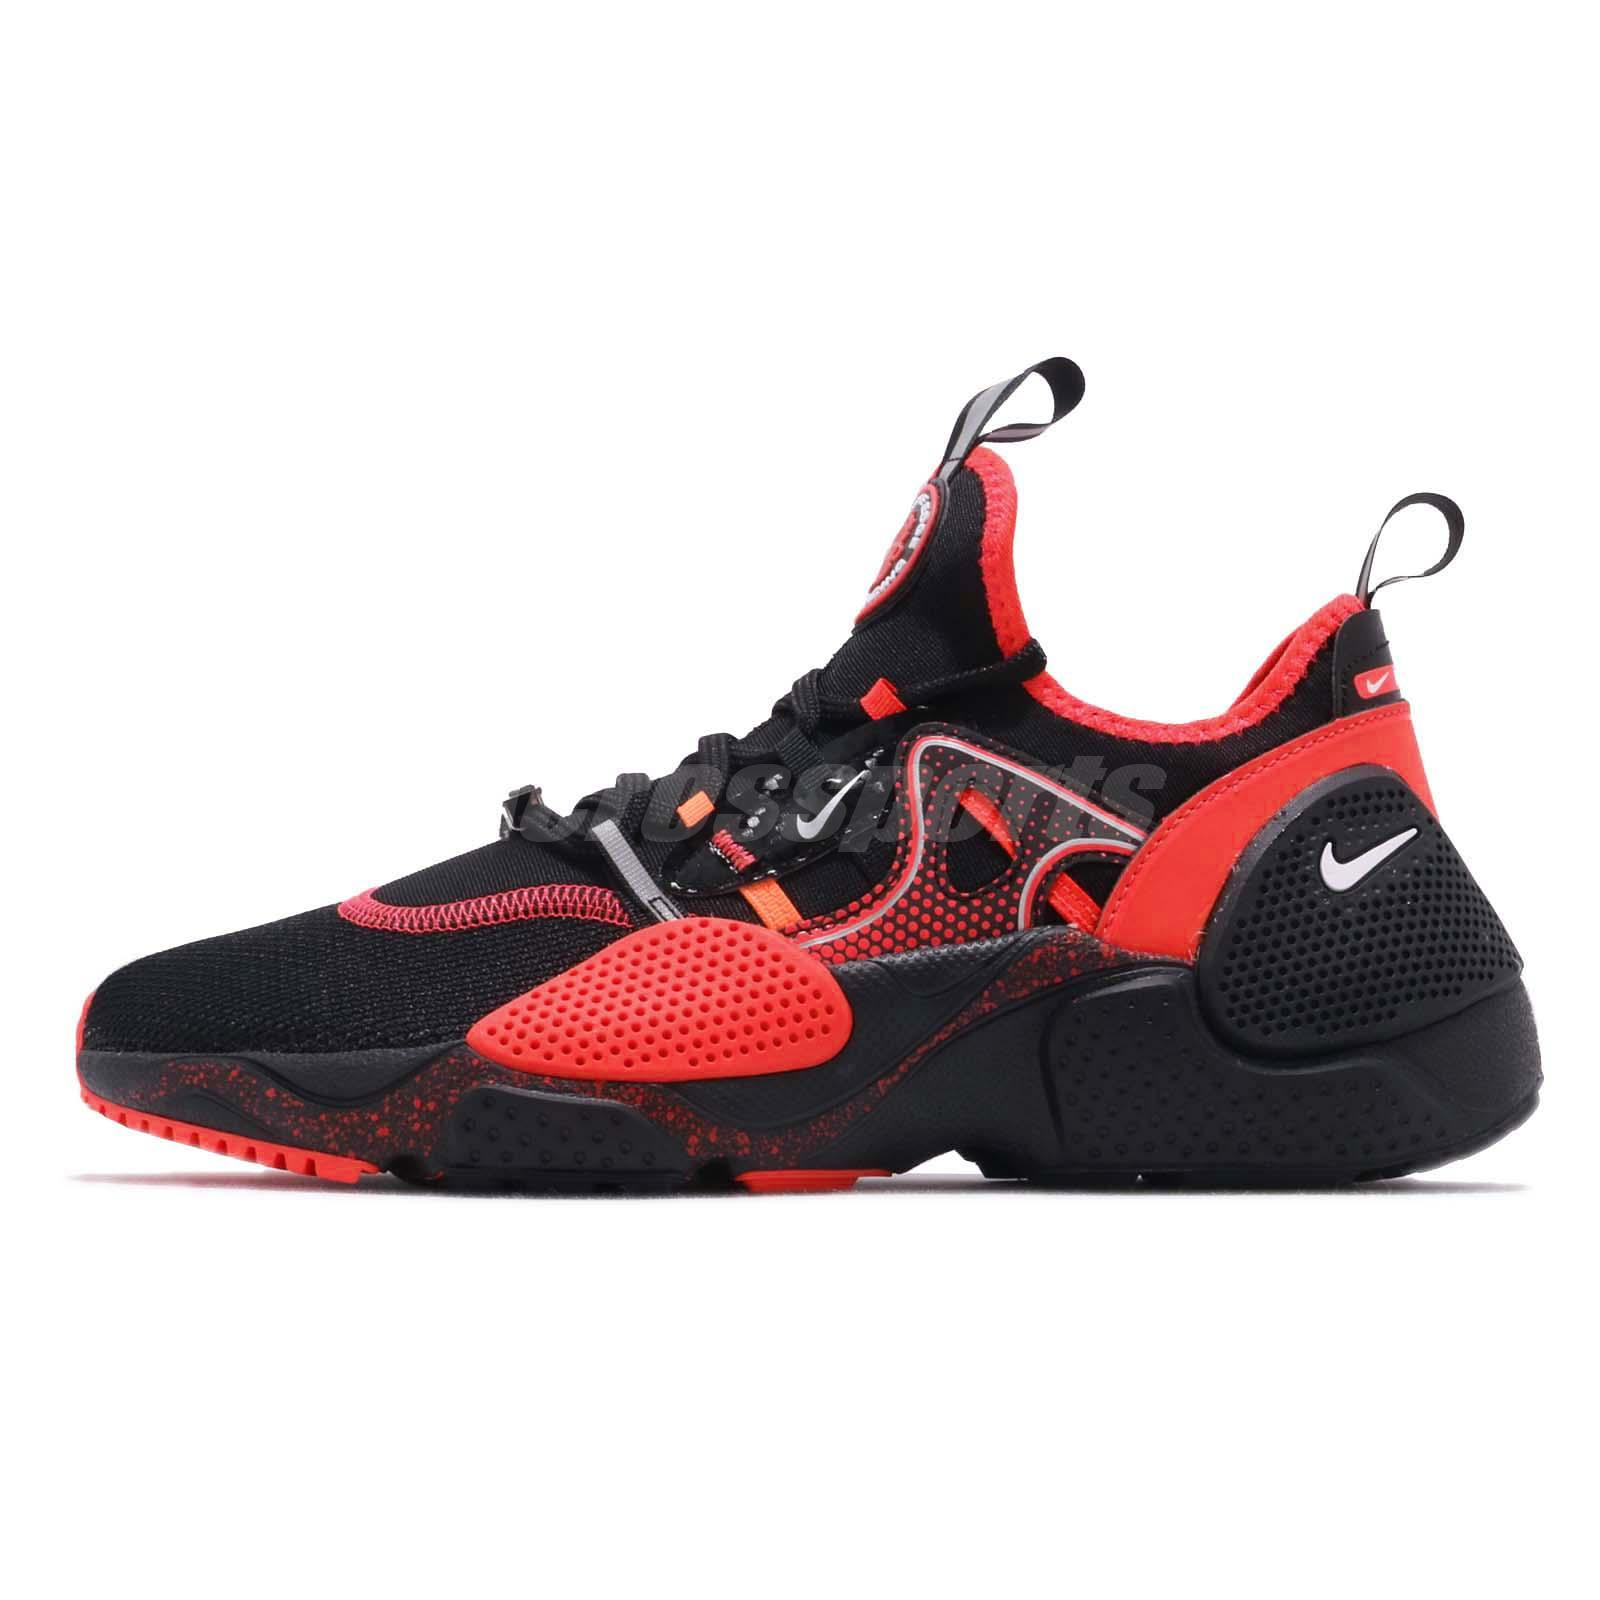 obuwie Cena hurtowa renomowana strona Details about Nike Huarache E.D.G.E. AS QS All Star Racing Team Men Running  Shoes BV8171-001